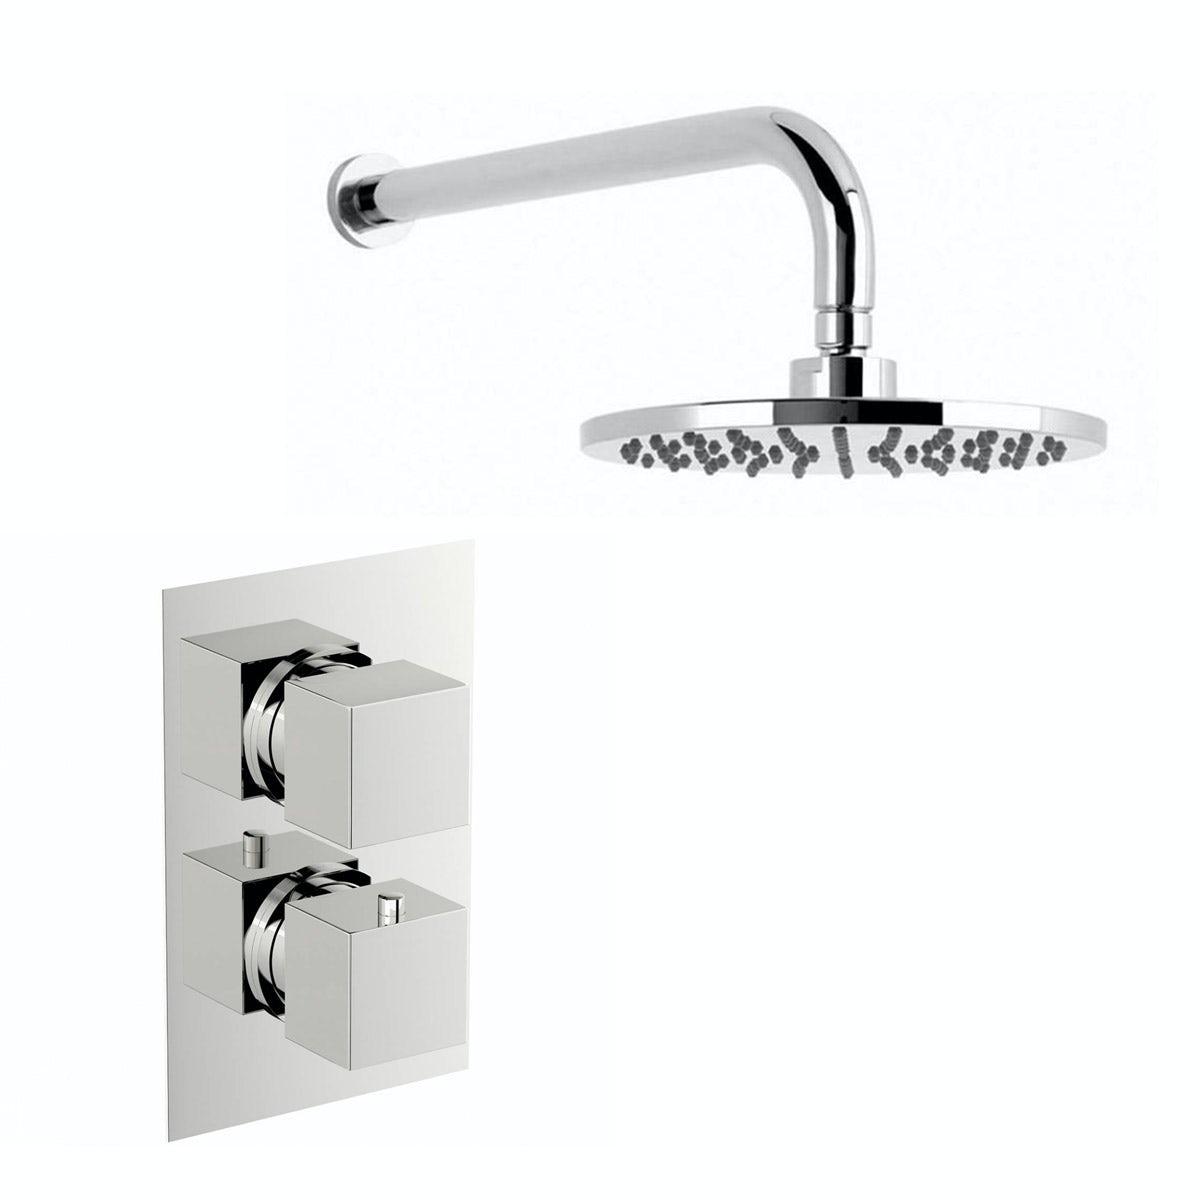 Mode Ellis thermostatic shower set